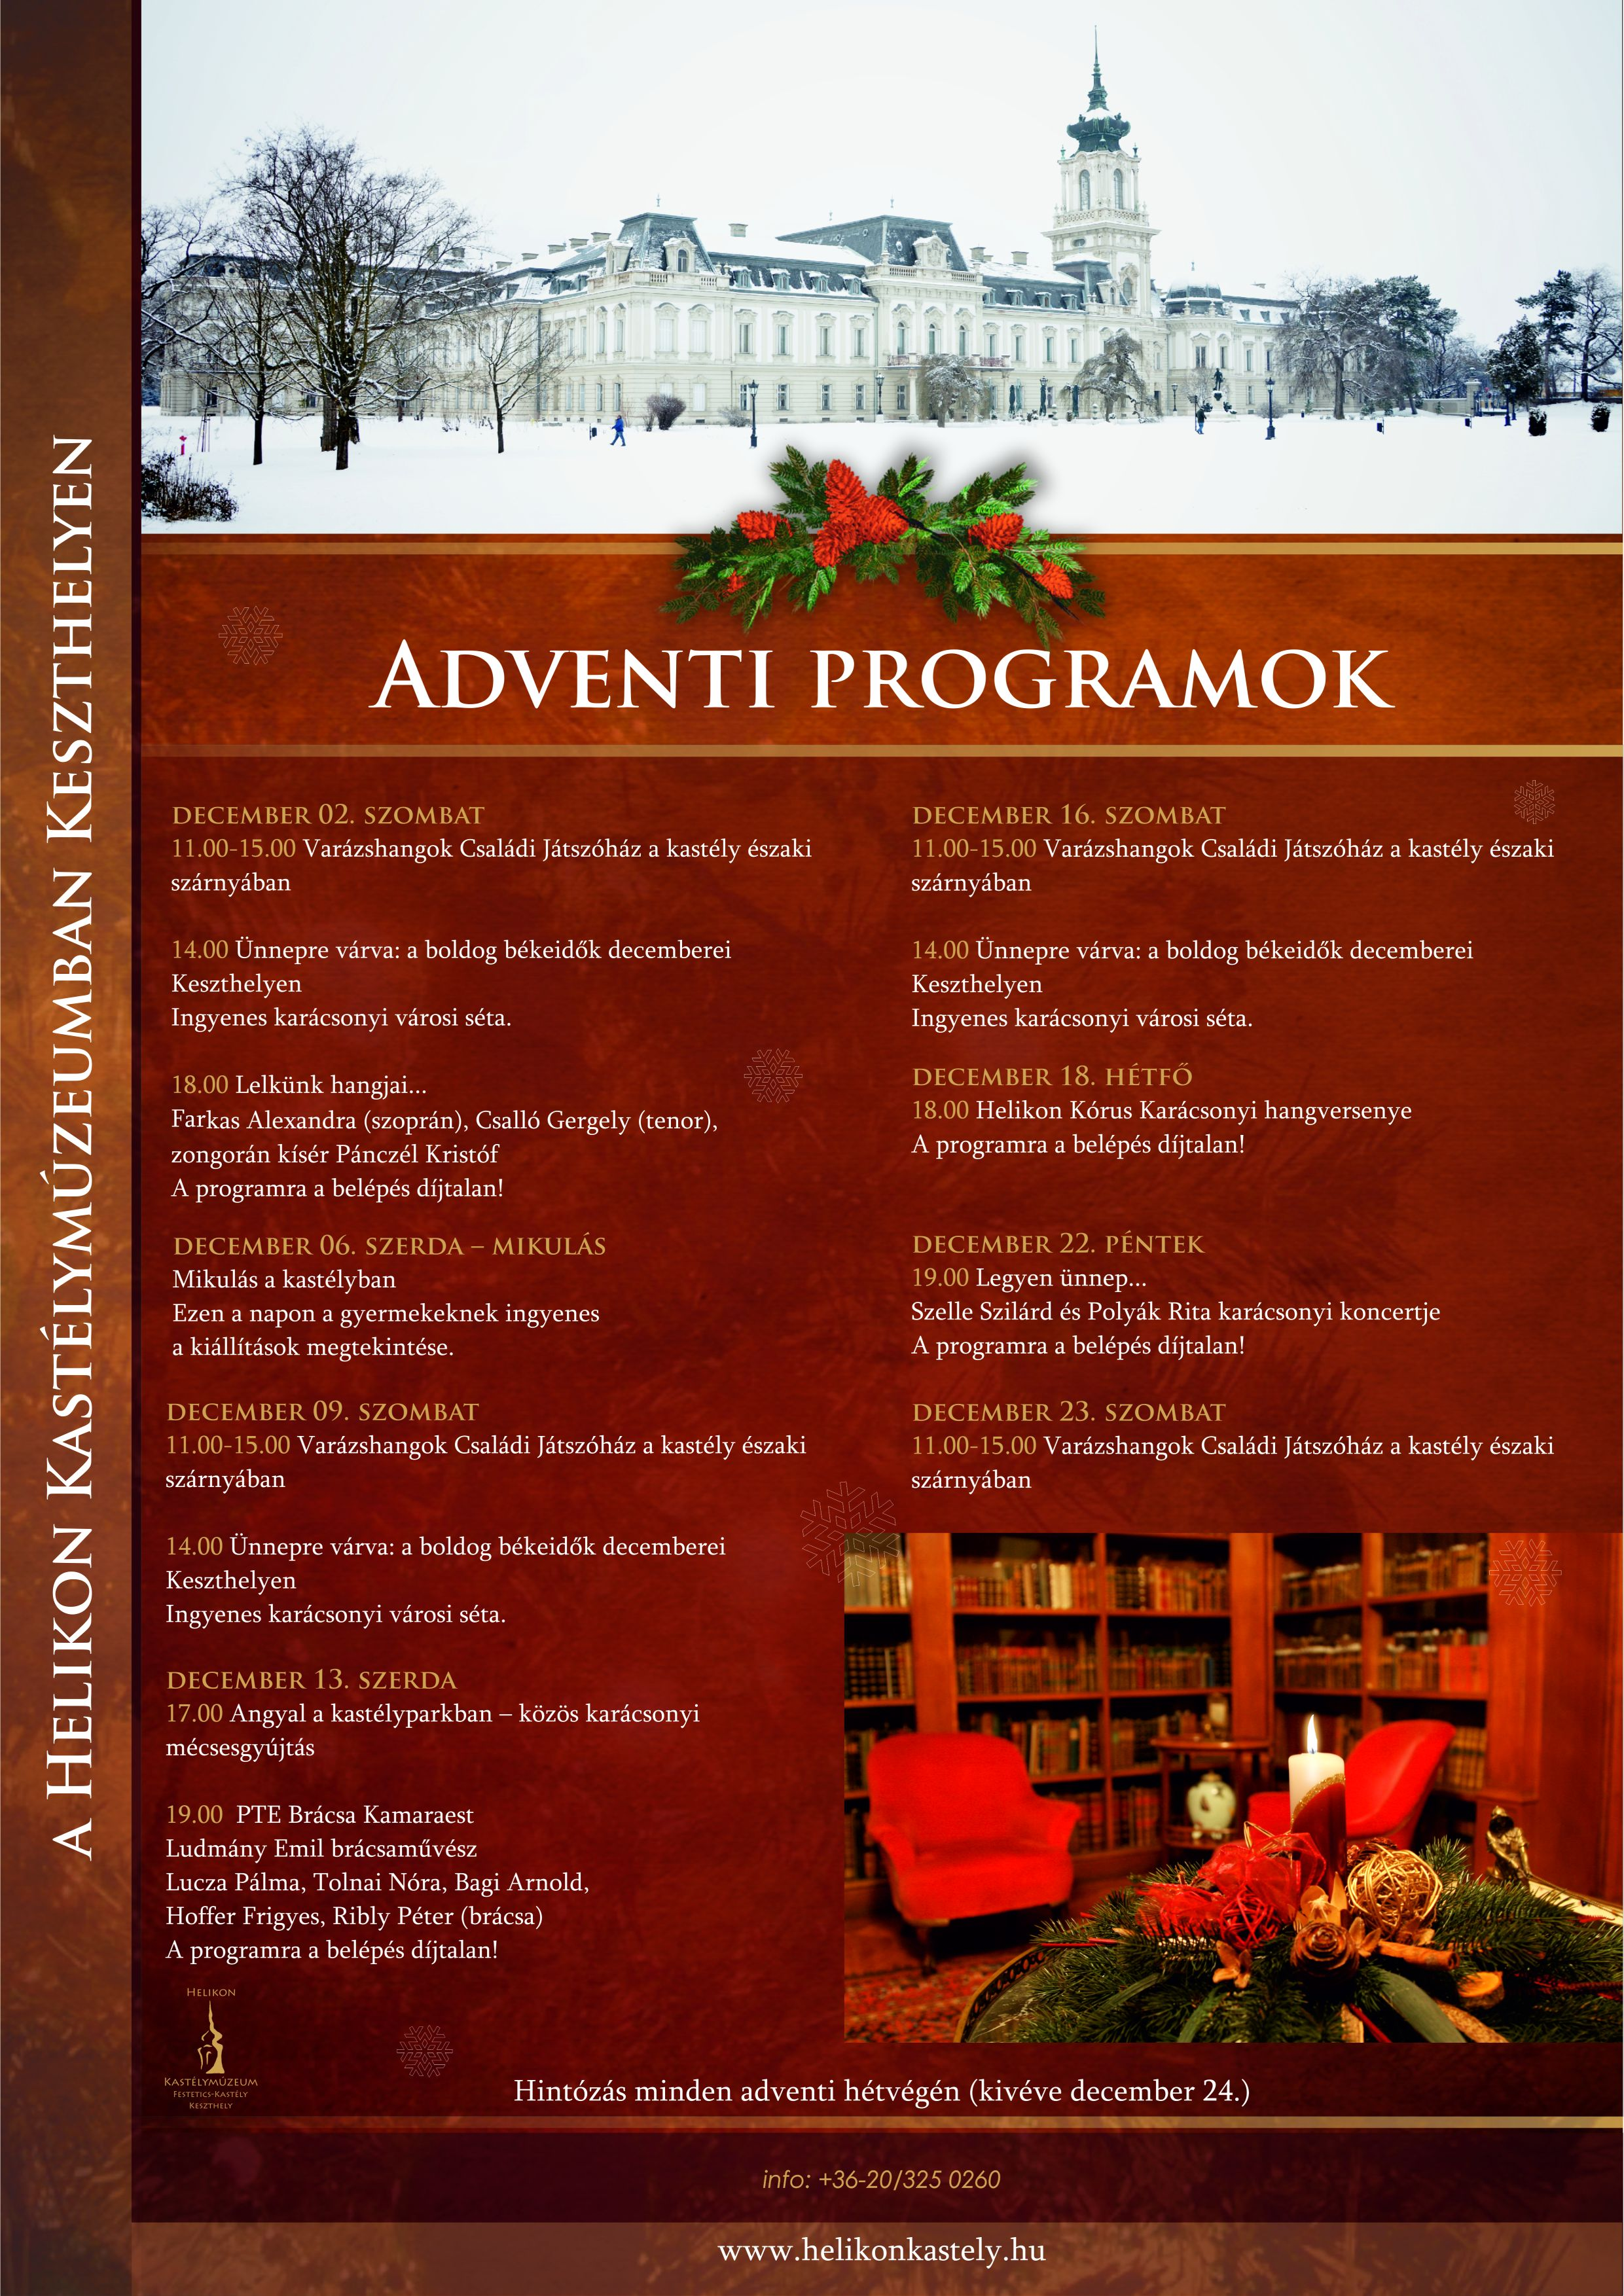 fgy-Adventi programok